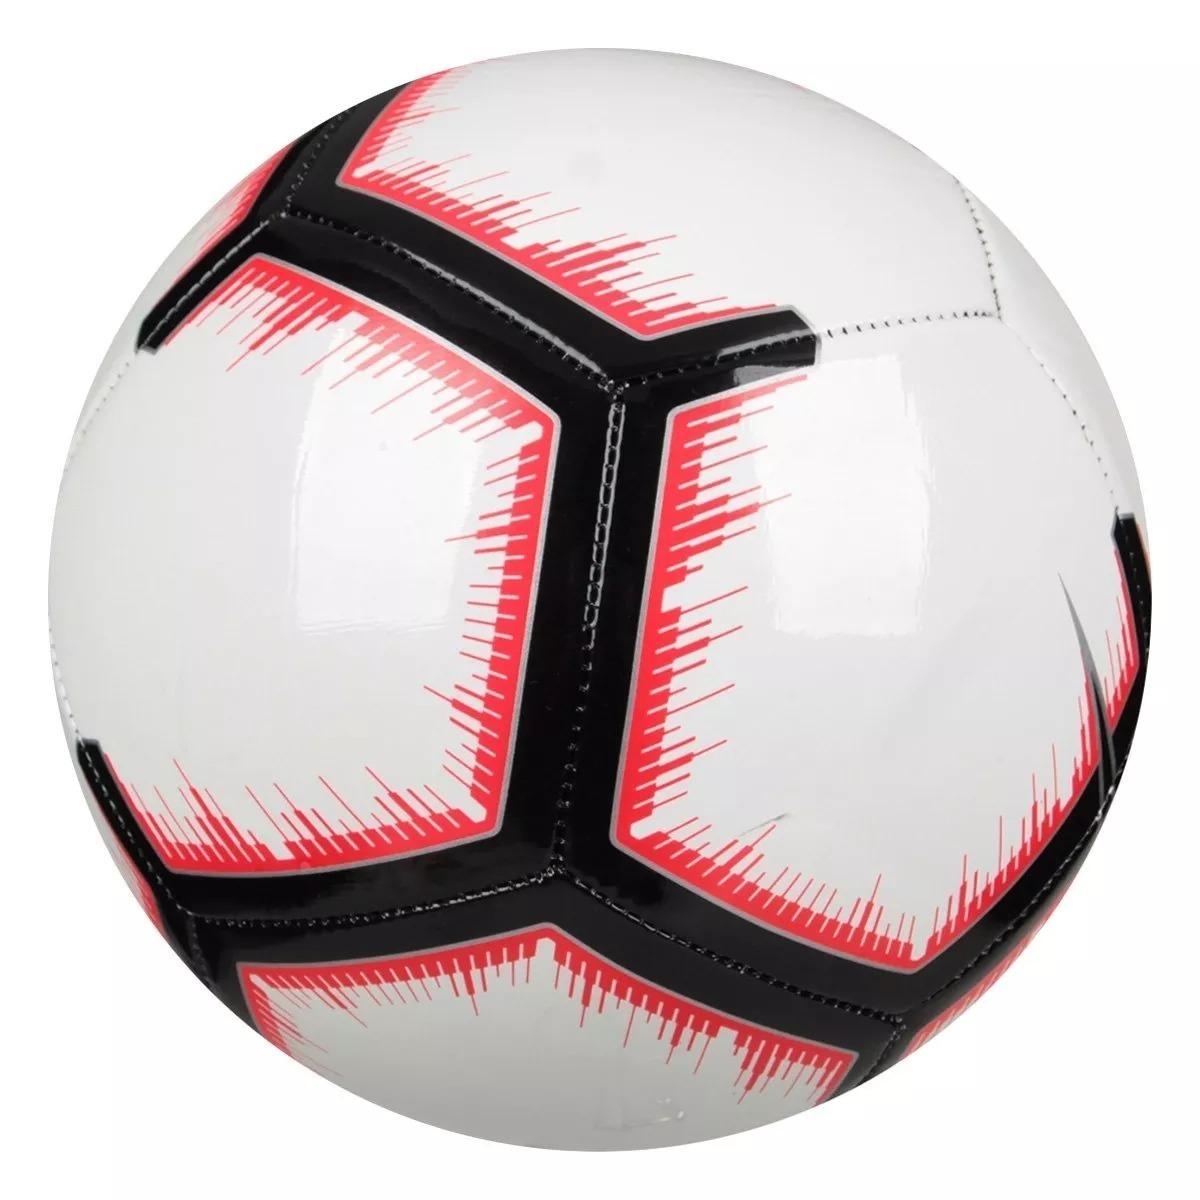 bola nike campo pitch branco vermelho. Carregando zoom. 5651eb1ba33b9